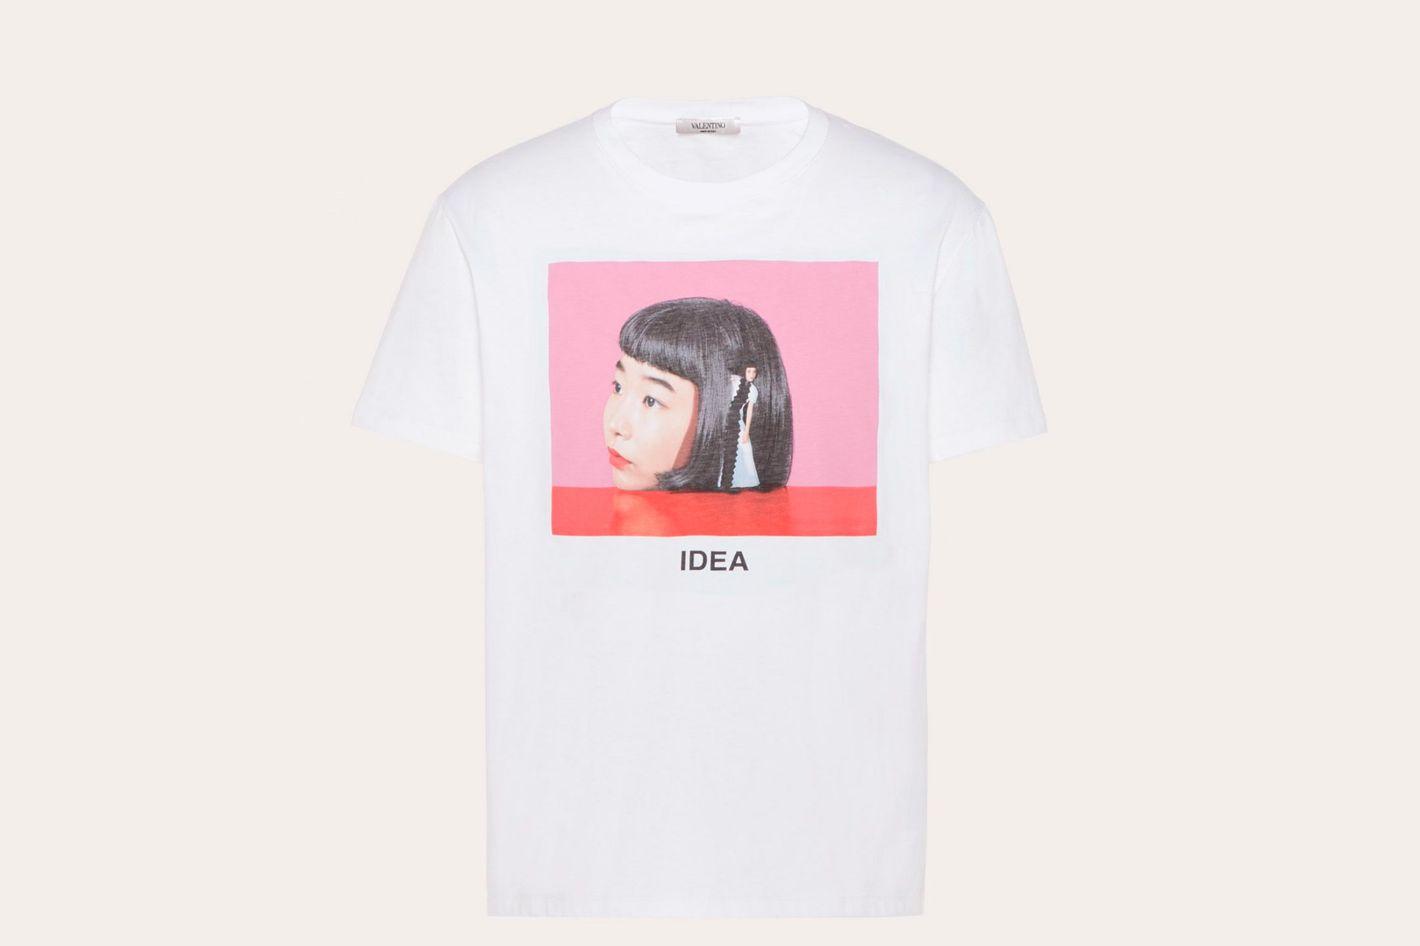 Izumi Miyazaki T-shirt in Pink